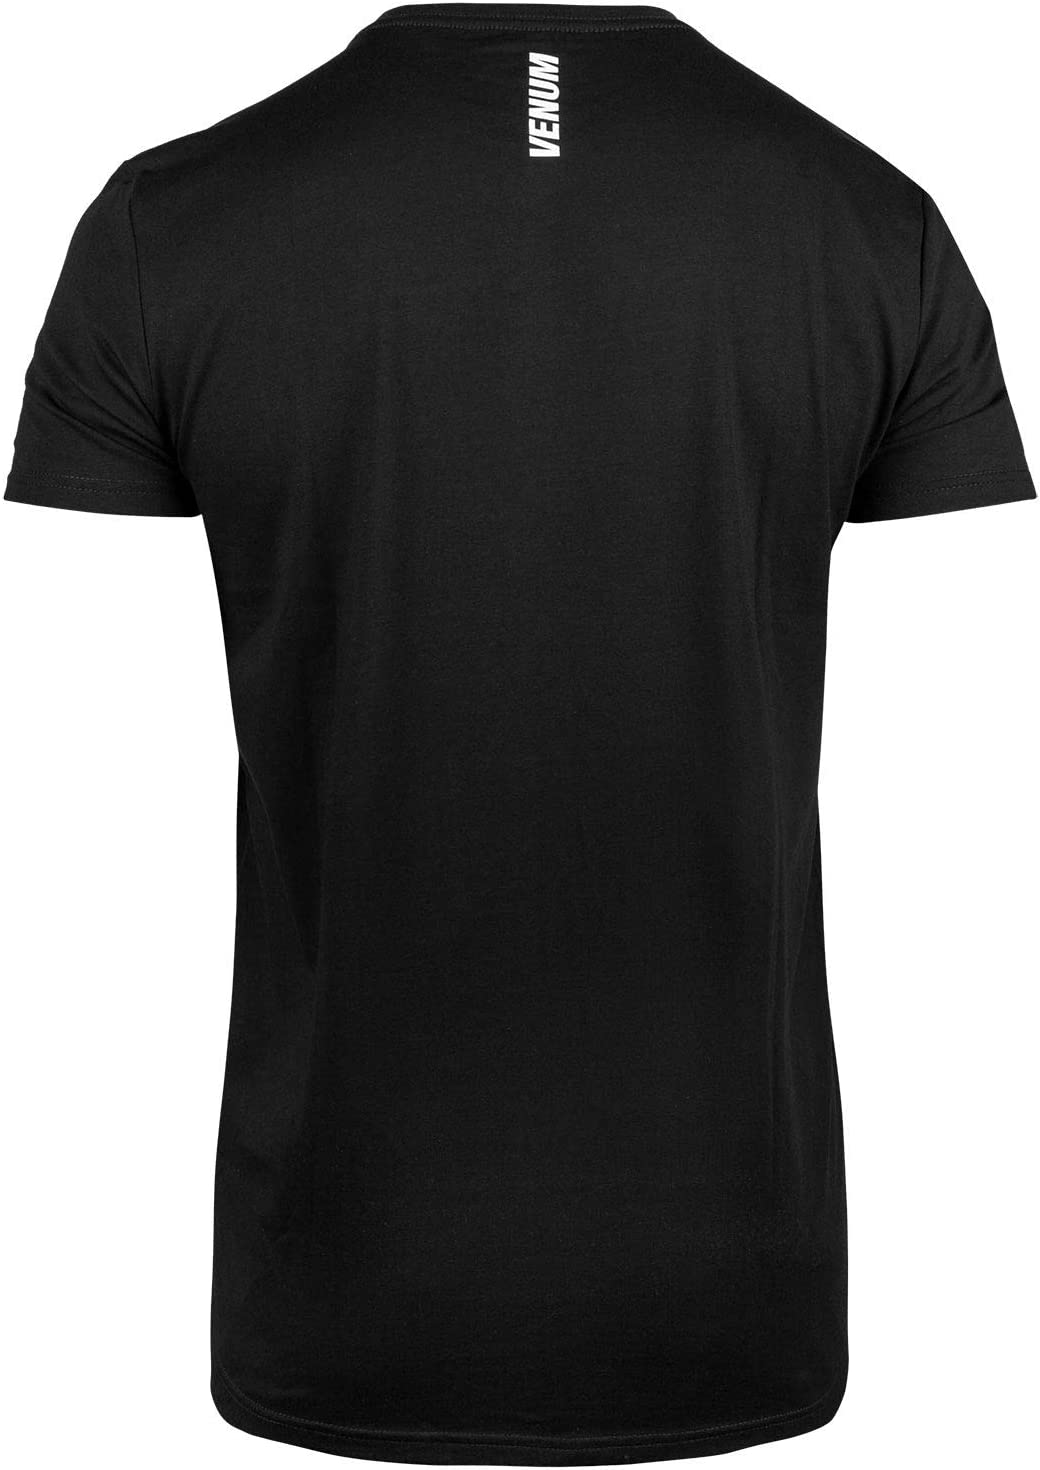 Venum Mens Muay Thai Vt T-Shirts